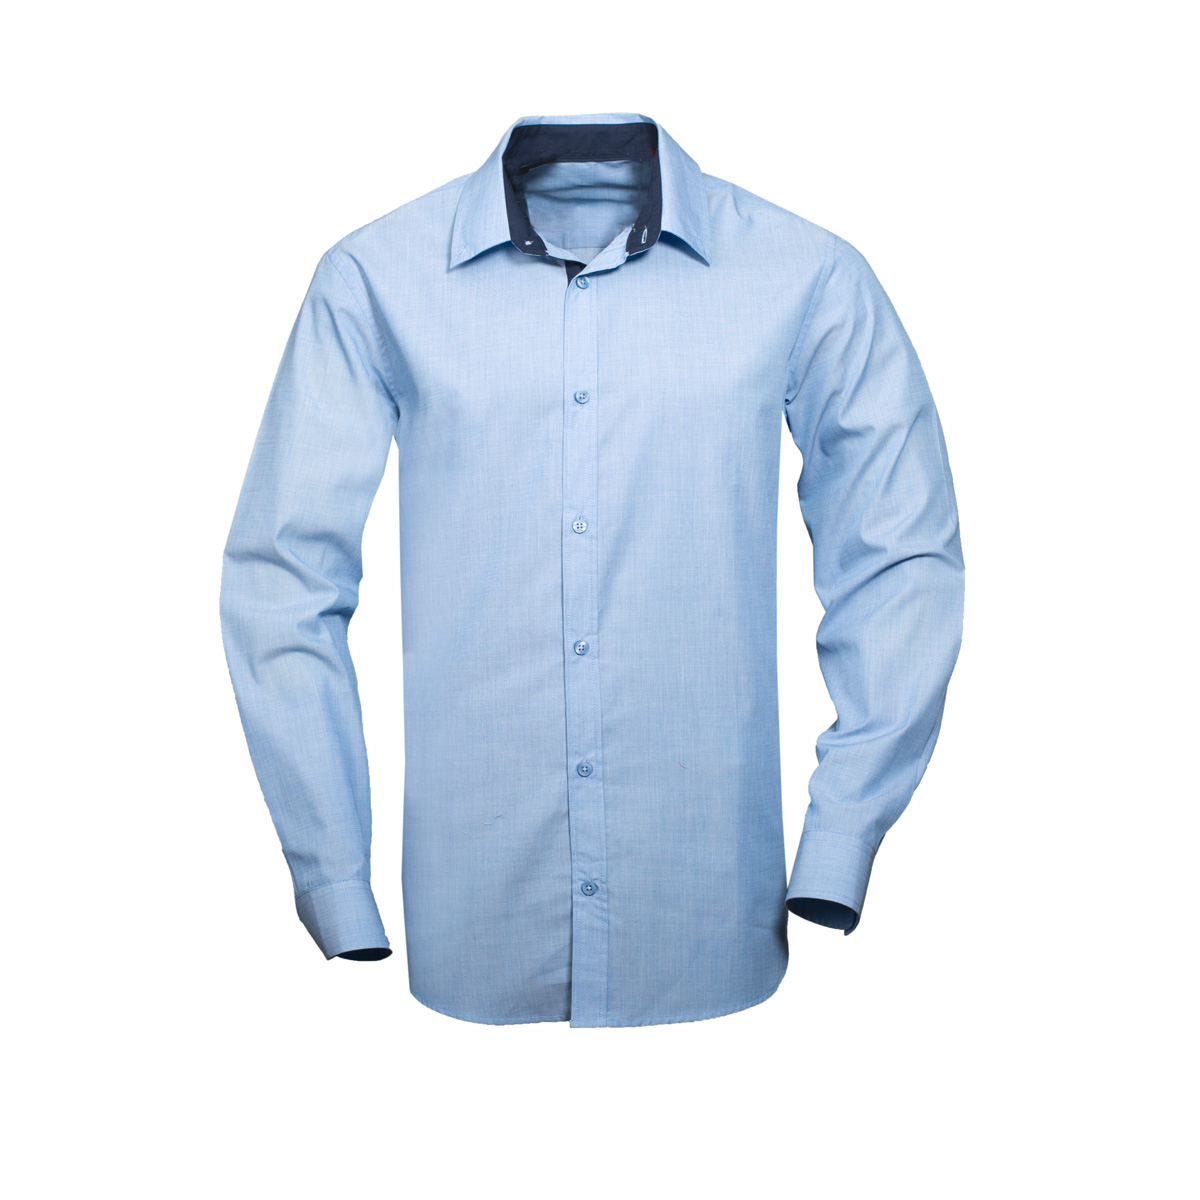 Moška srajca, svetlo modra